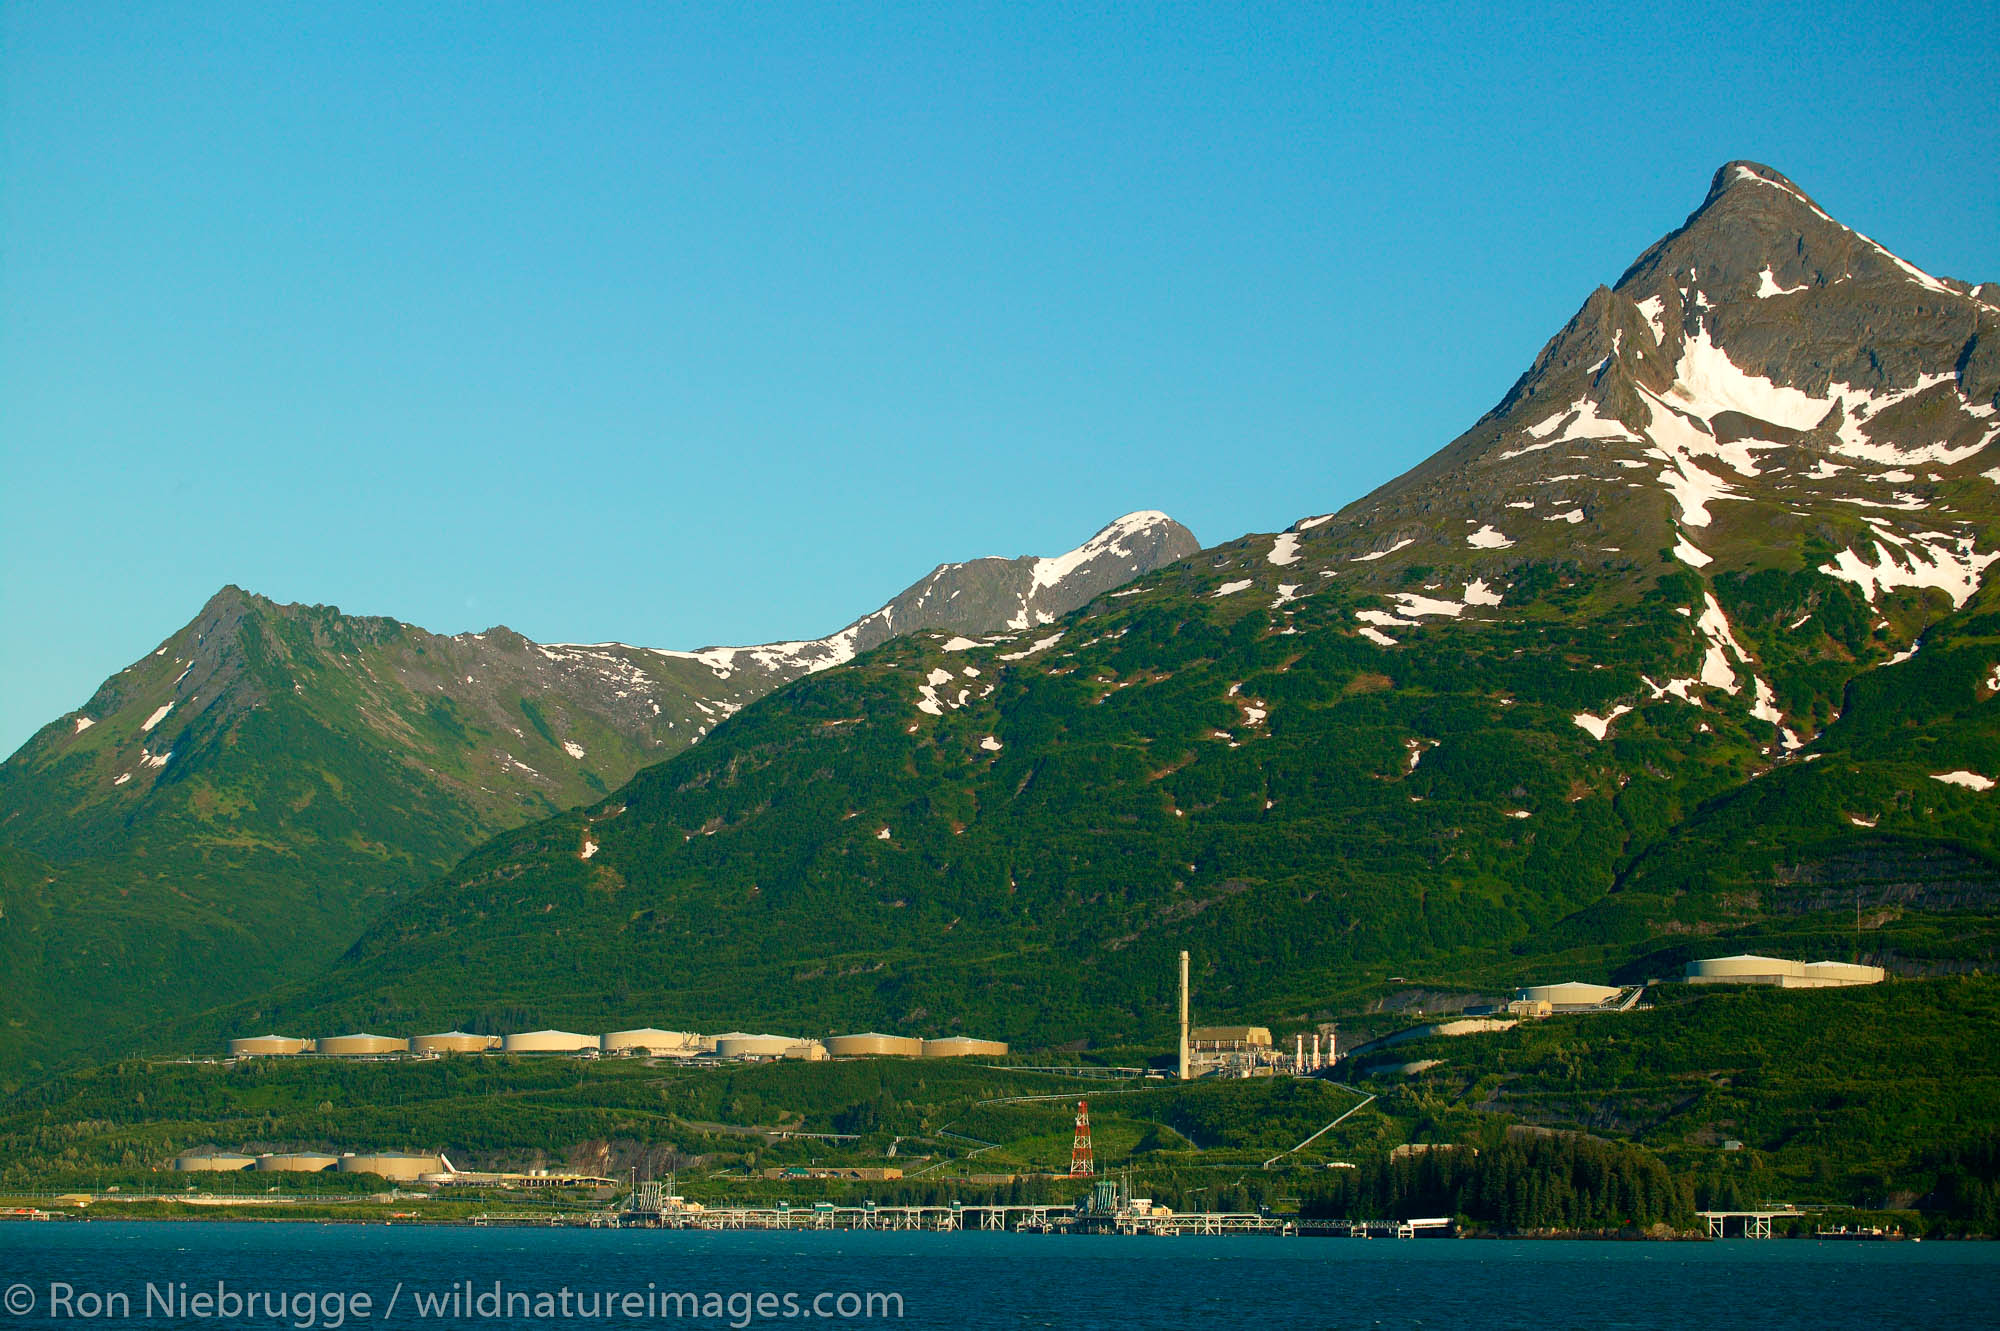 The Trans-Alaska Pipeline Terminal from the Alaska State Ferry Aurora, Prince William Sound, Valdez, Alaska.